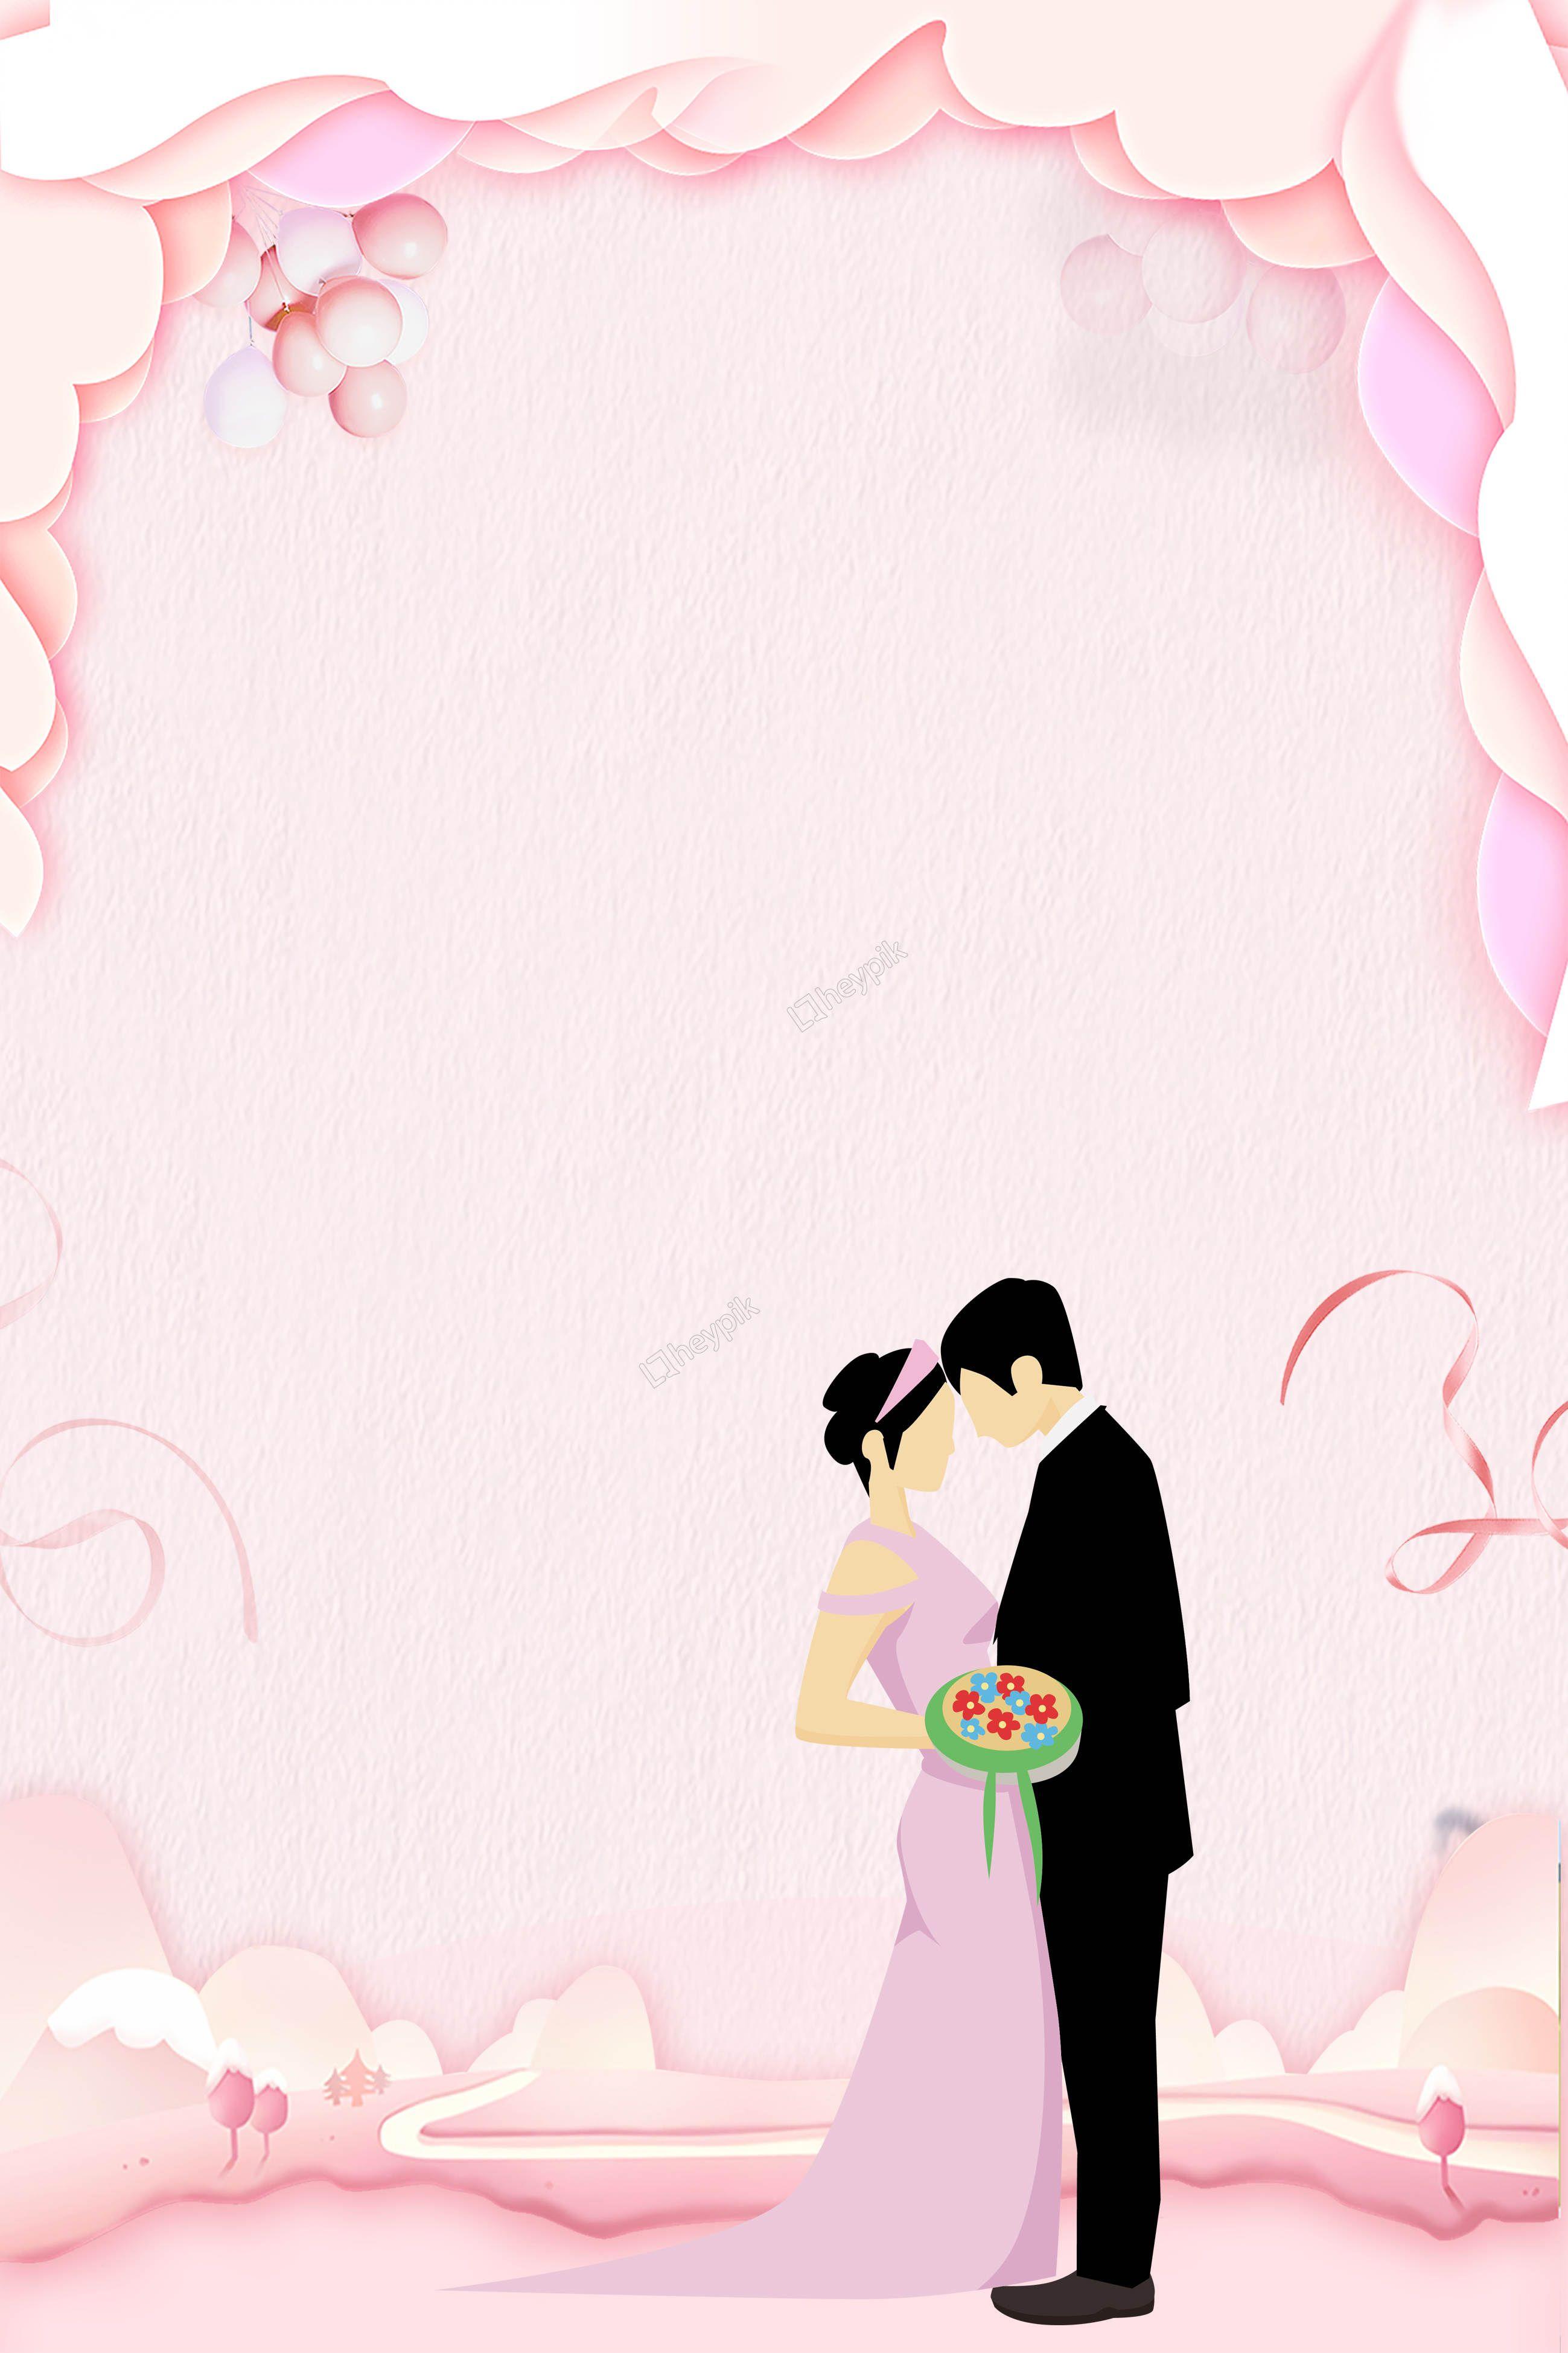 Hand Drawn Cartoon Wedding Invitation H5 Background Free